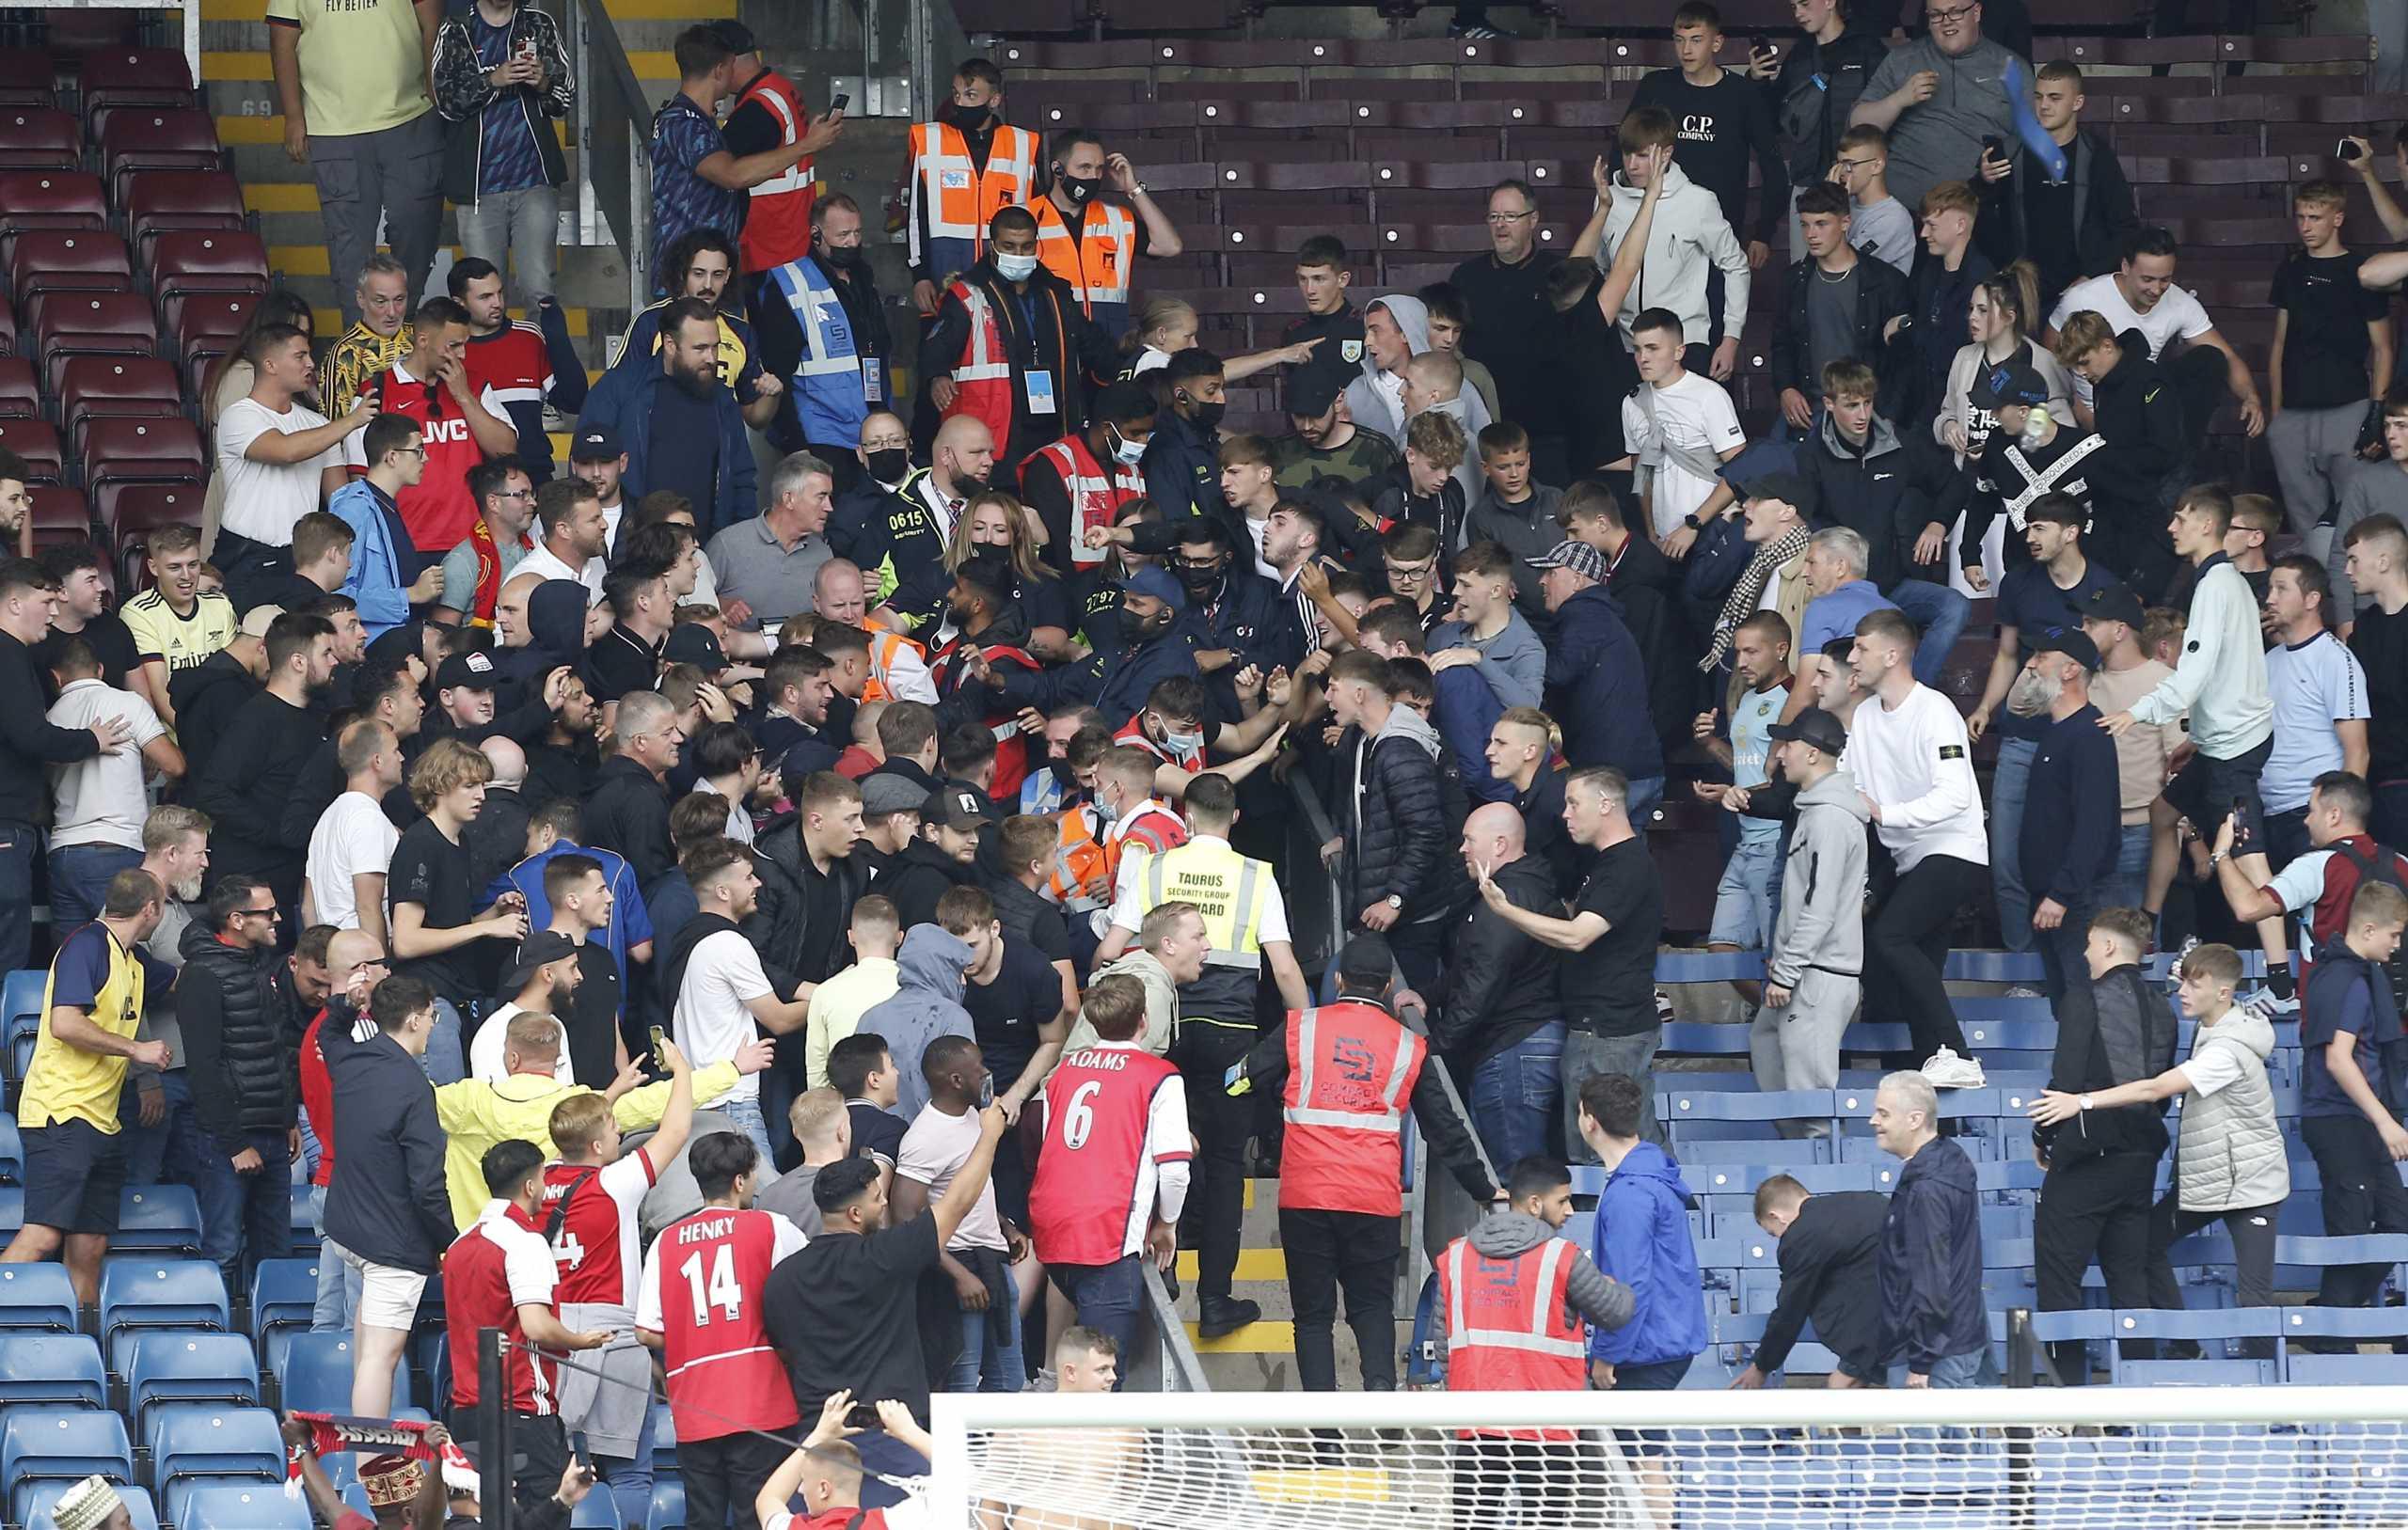 Premier League: Άγριο ξύλο μεταξύ οπαδών μετά τη λήξη του Μπέρνλι – Άρσεναλ